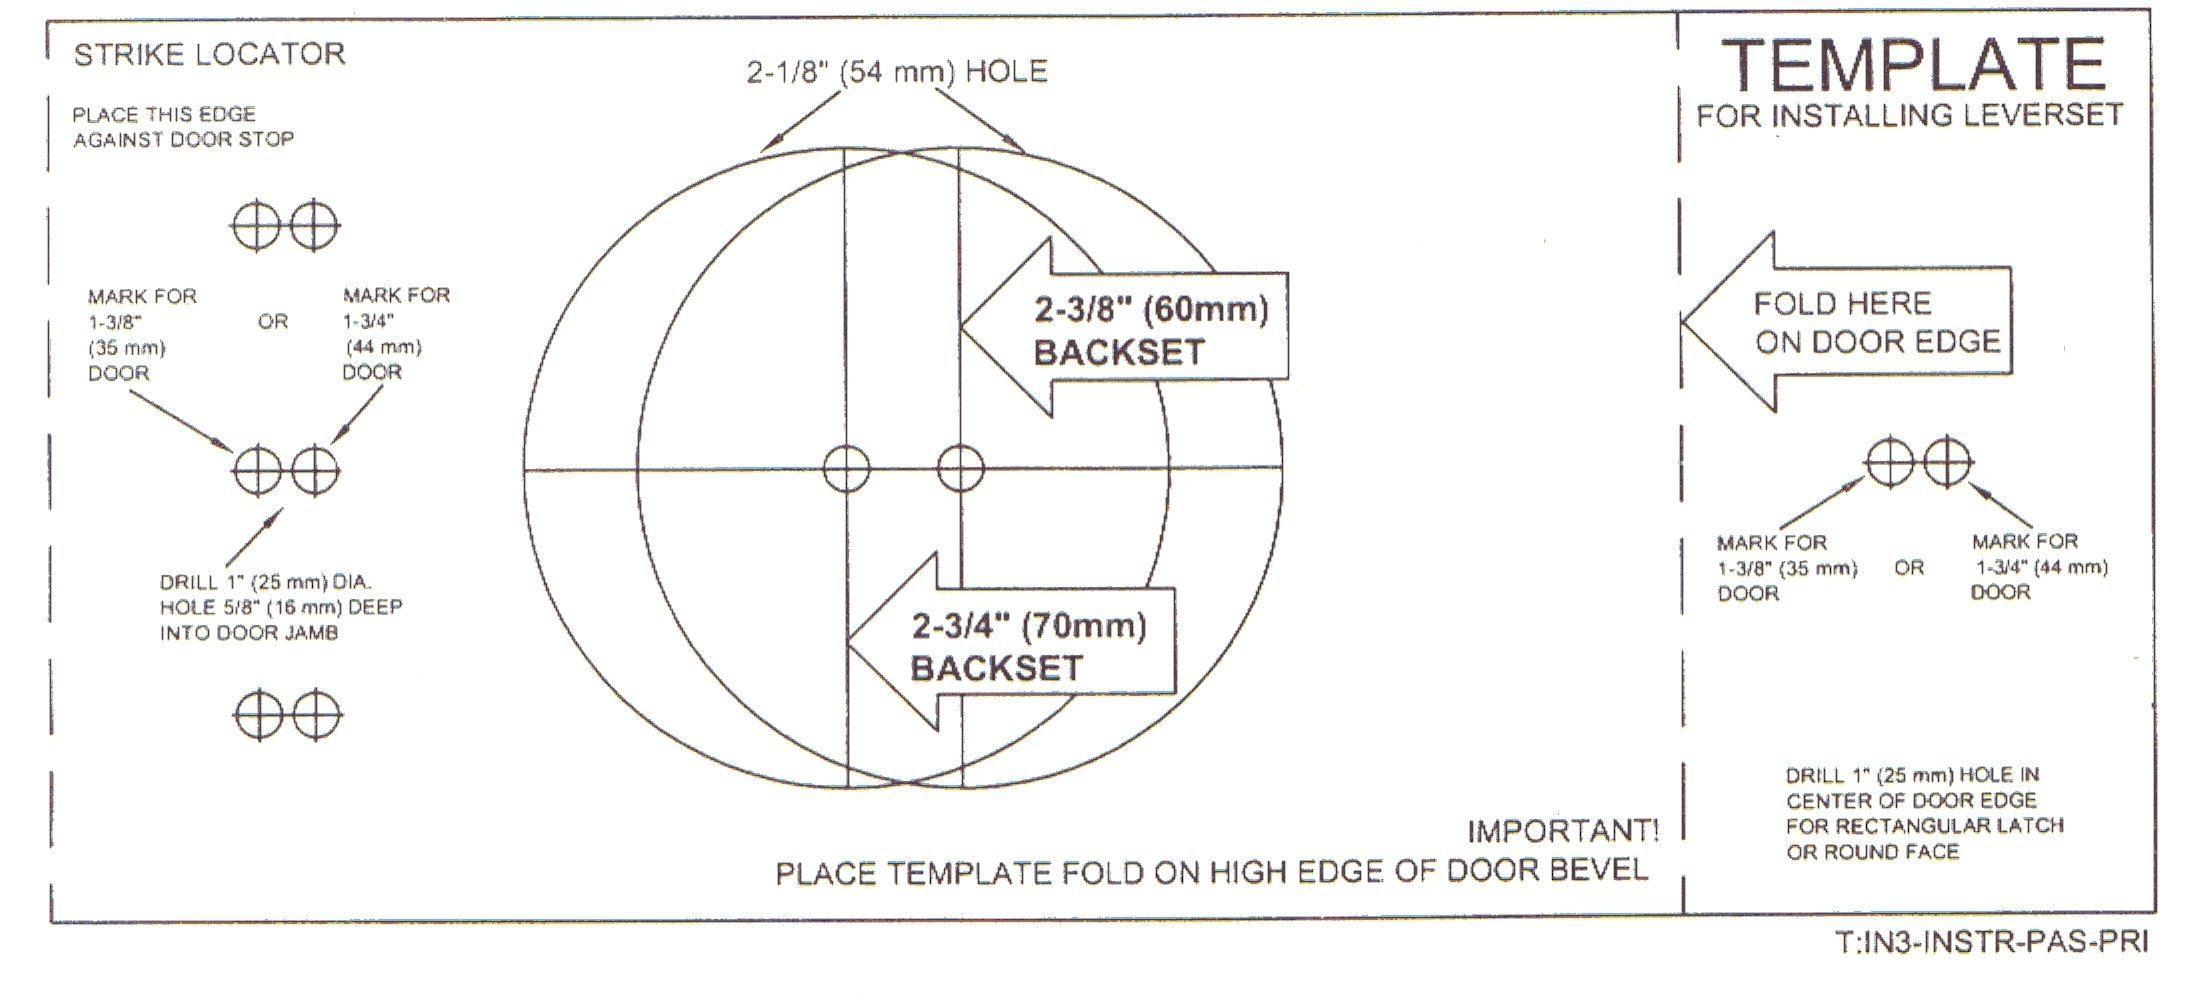 four bolt pattern toilet instructions